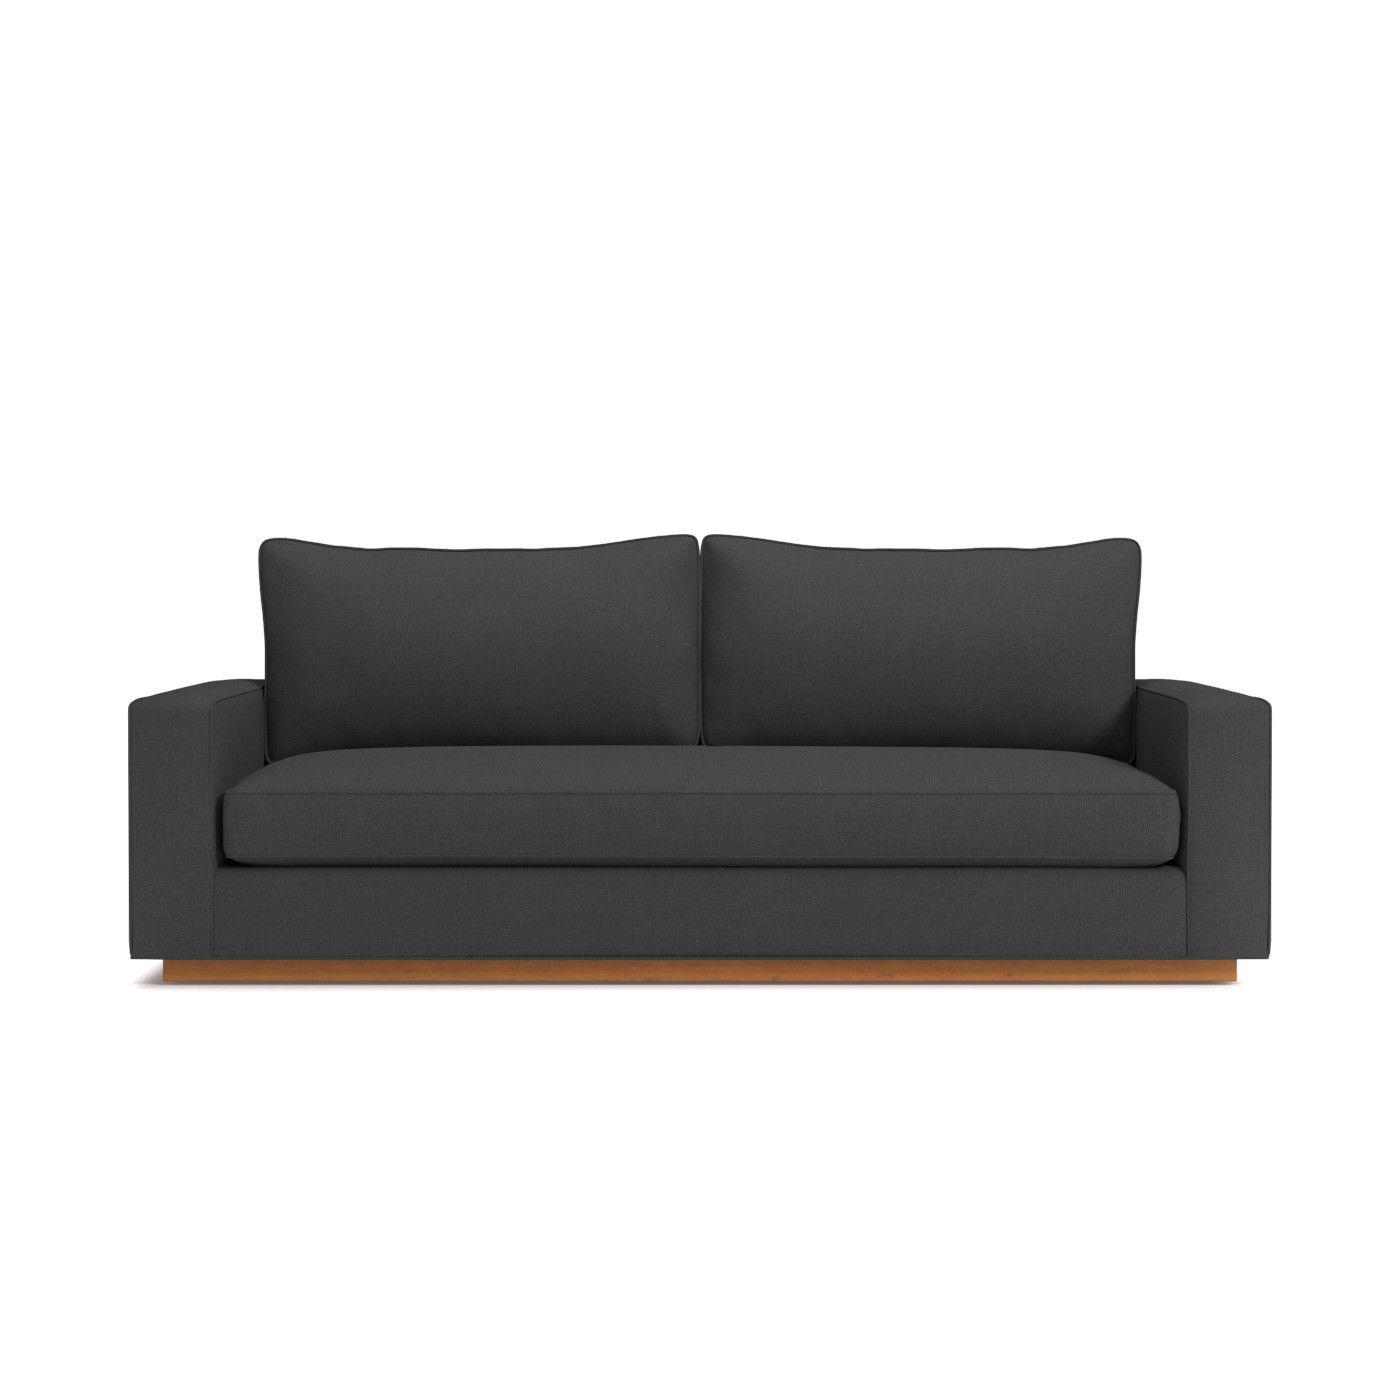 Harper Sofa by Kyle Schuneman CHOICE OF FABRICS